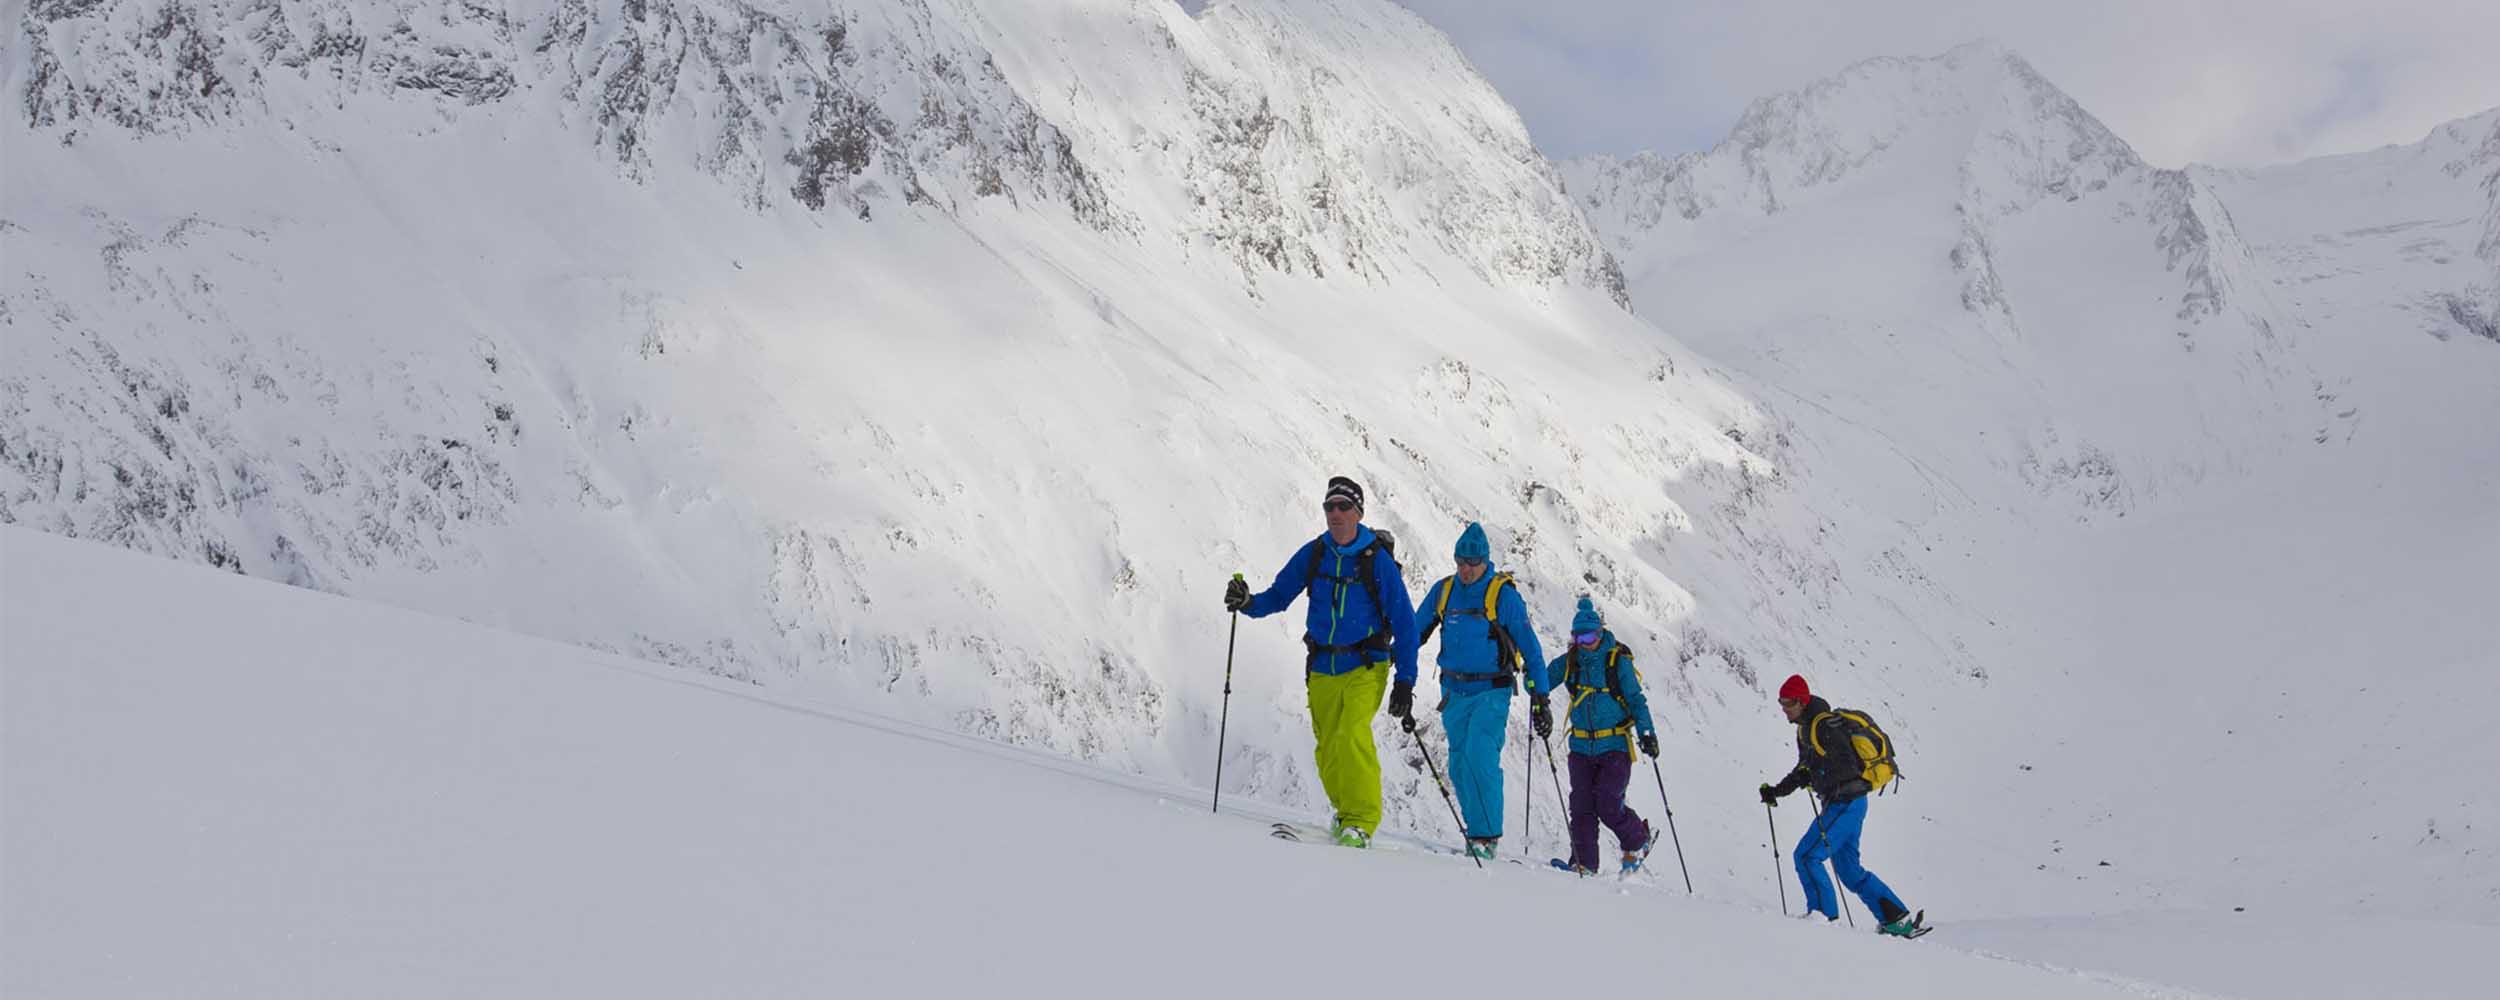 Ski de rando à La Rosière